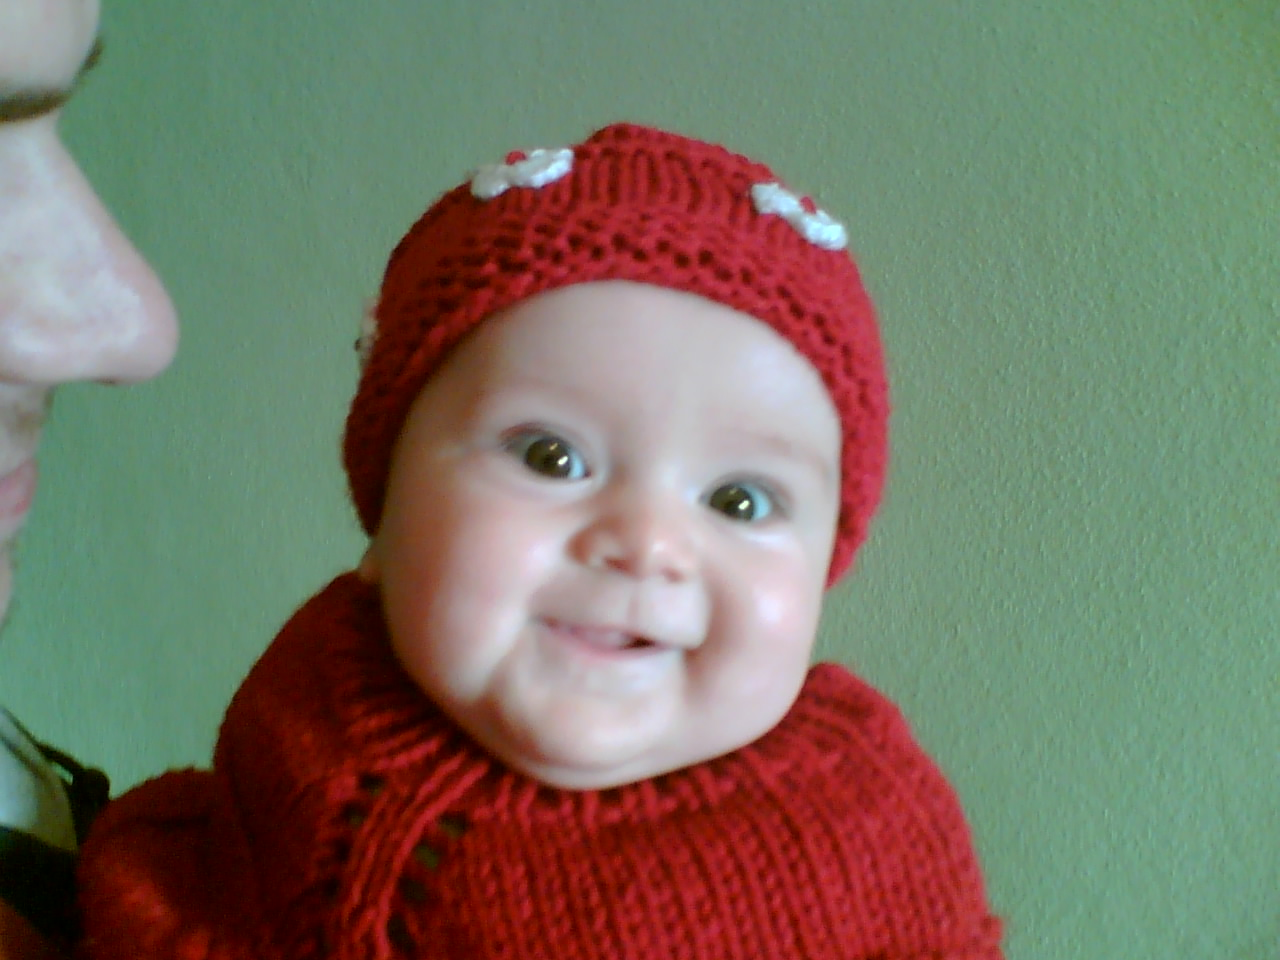 http://1.bp.blogspot.com/-pOgLc5Attq8/Td1sPE1GQ9I/AAAAAAAAAF4/wg4TYE9J73I/s1600/funny_baby_pictures-funny-baby-wallpaper.jpg